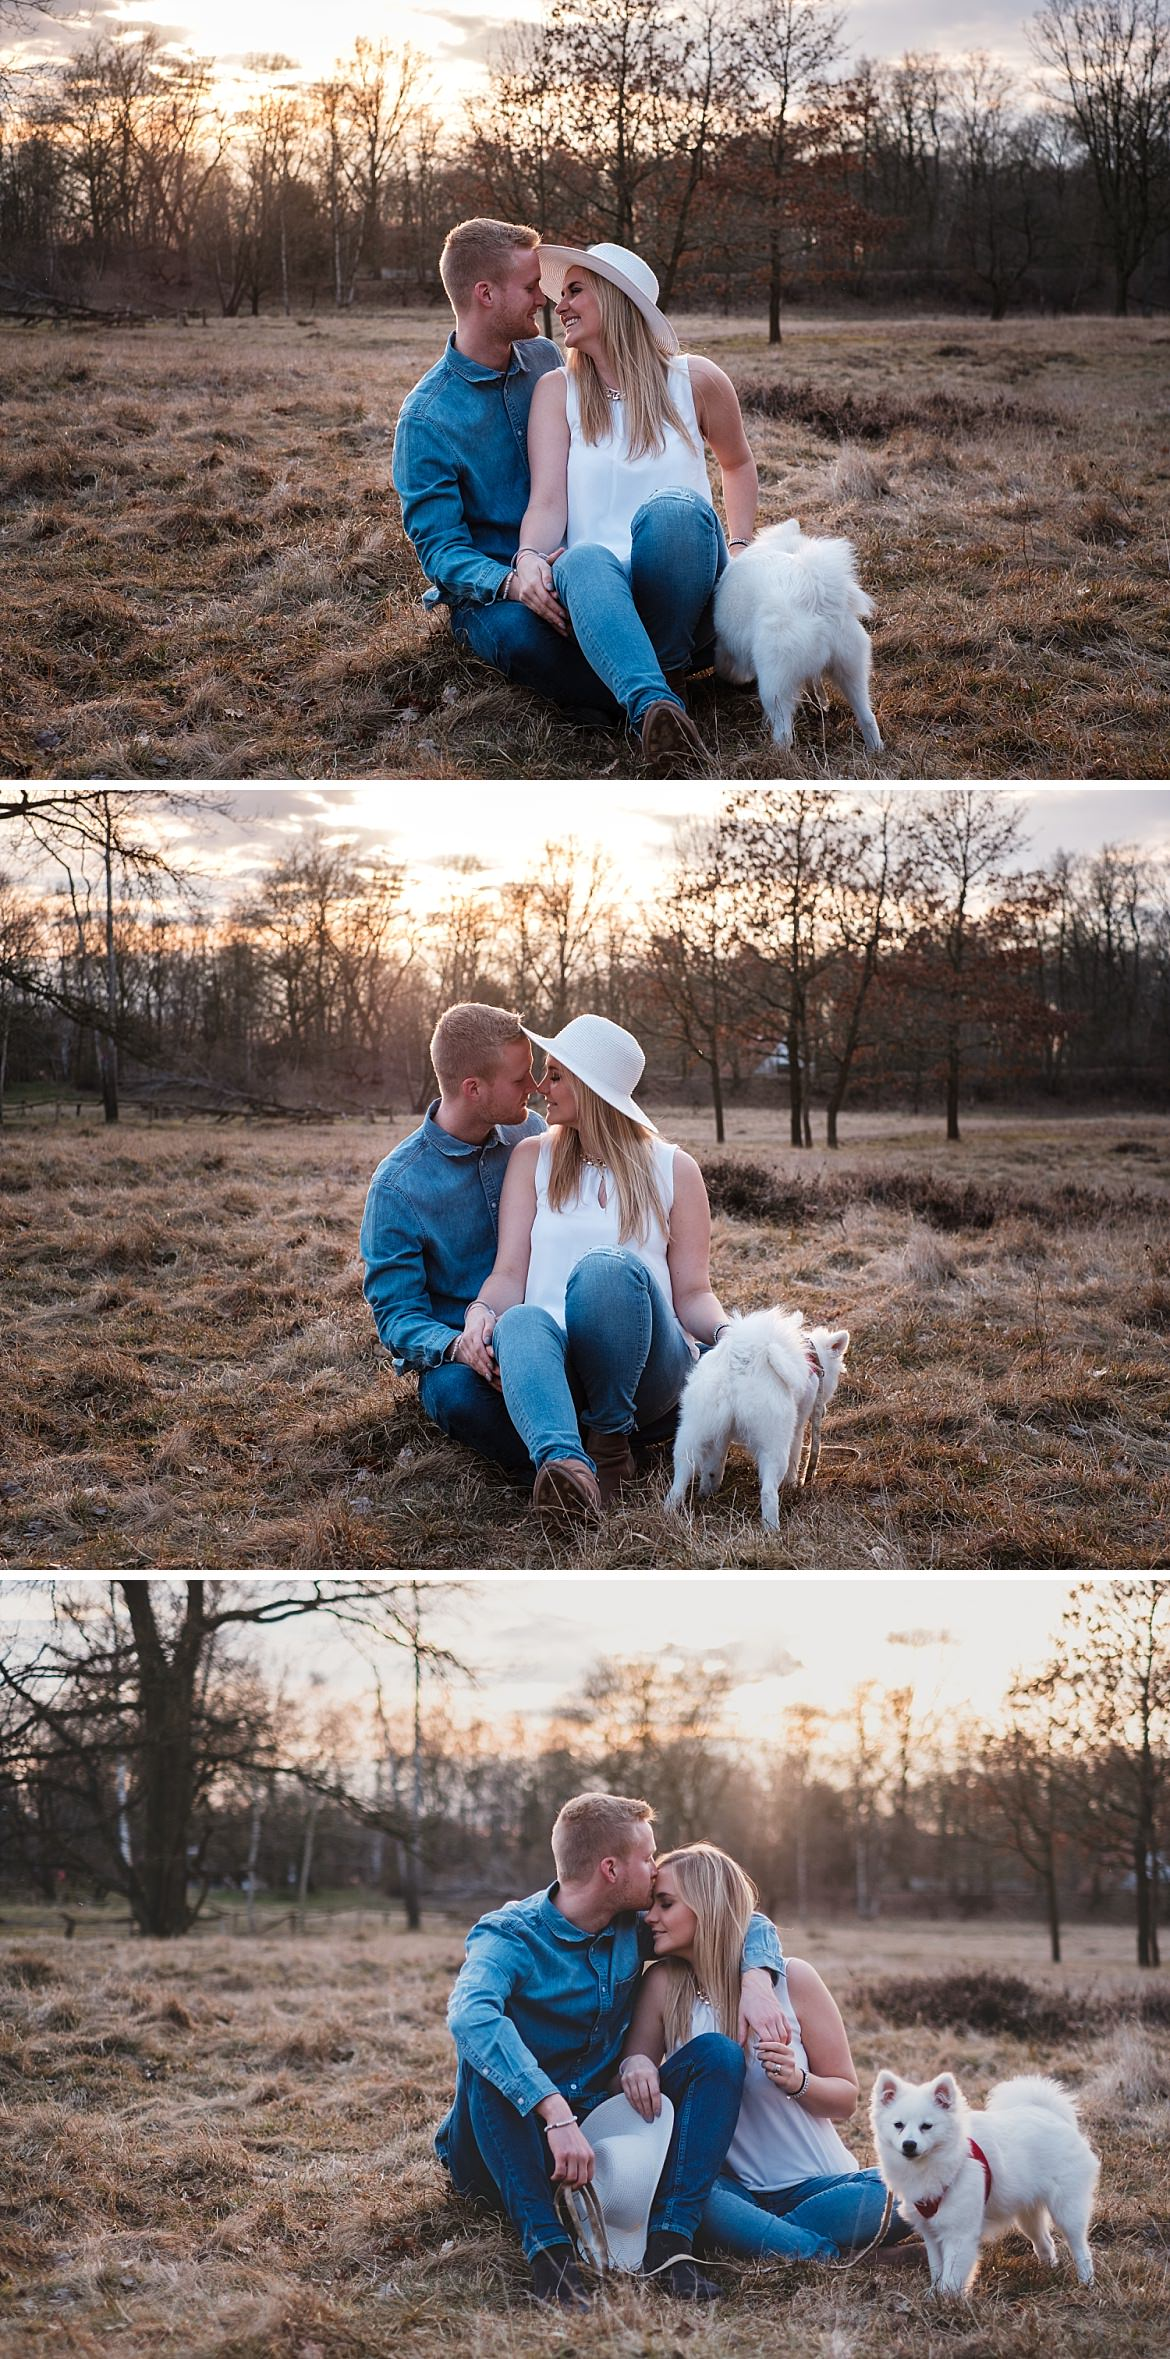 Pärchen mit Hund sitzt in den Boberger Dünen